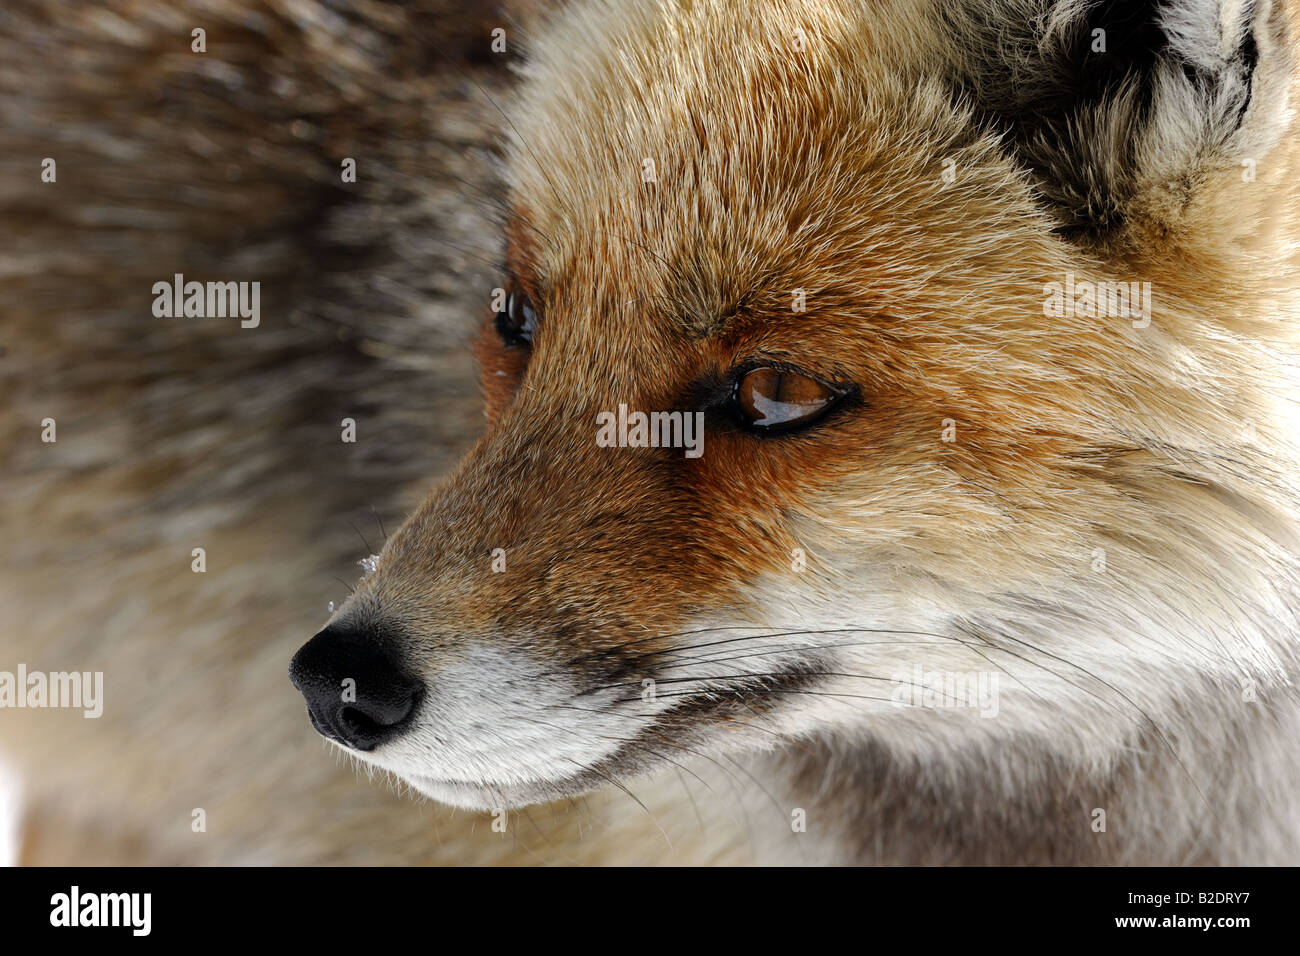 Fox volpi red Vulpes vulpes canidae mammifero Montagna neve invernale nevicata legno Italia volpe rossa Vulpes vulpes Immagini Stock